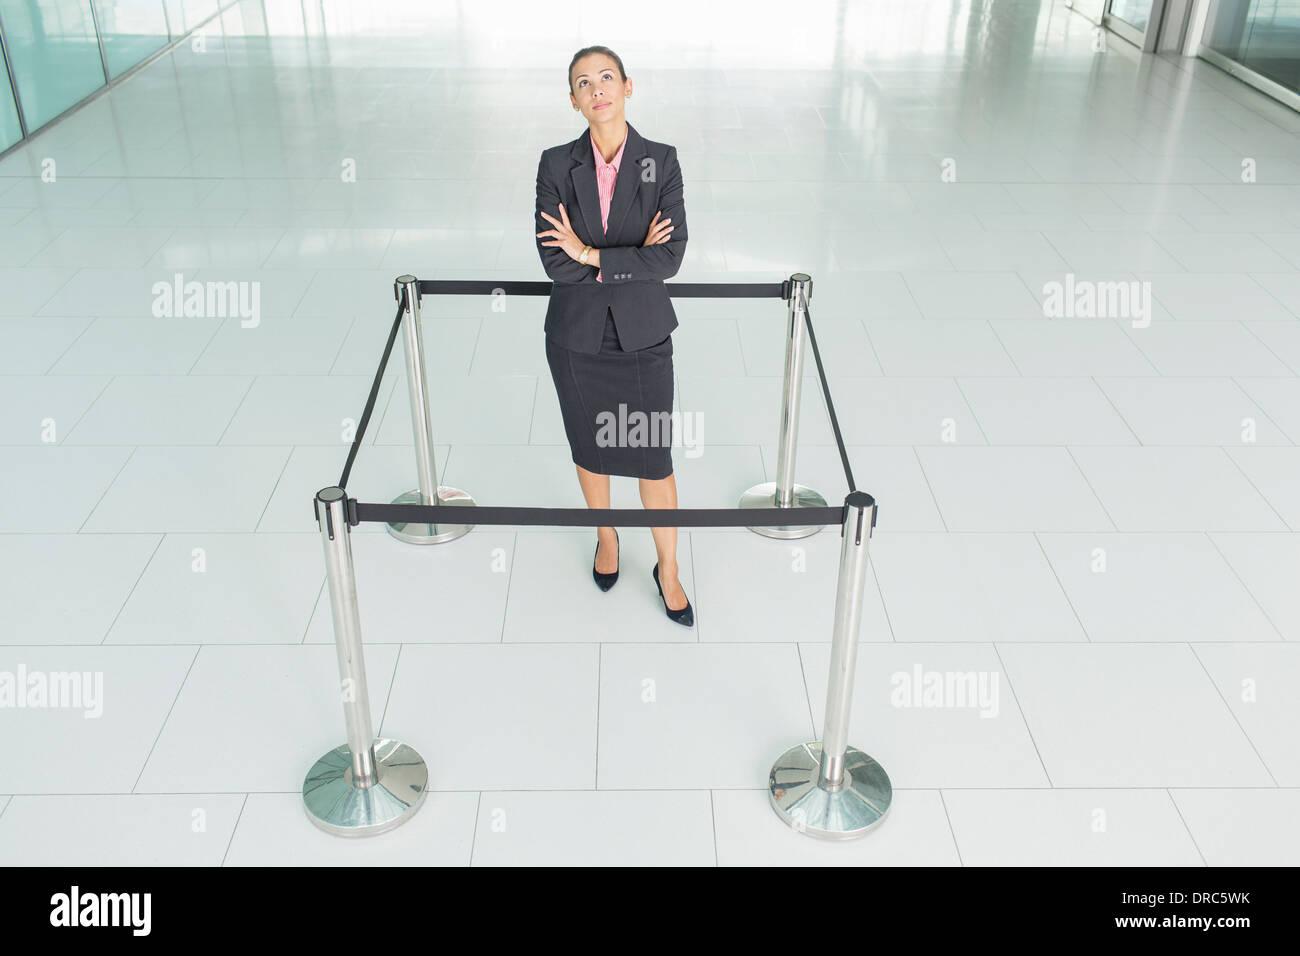 Imprenditrice in piedi in una cordata-off square Immagini Stock